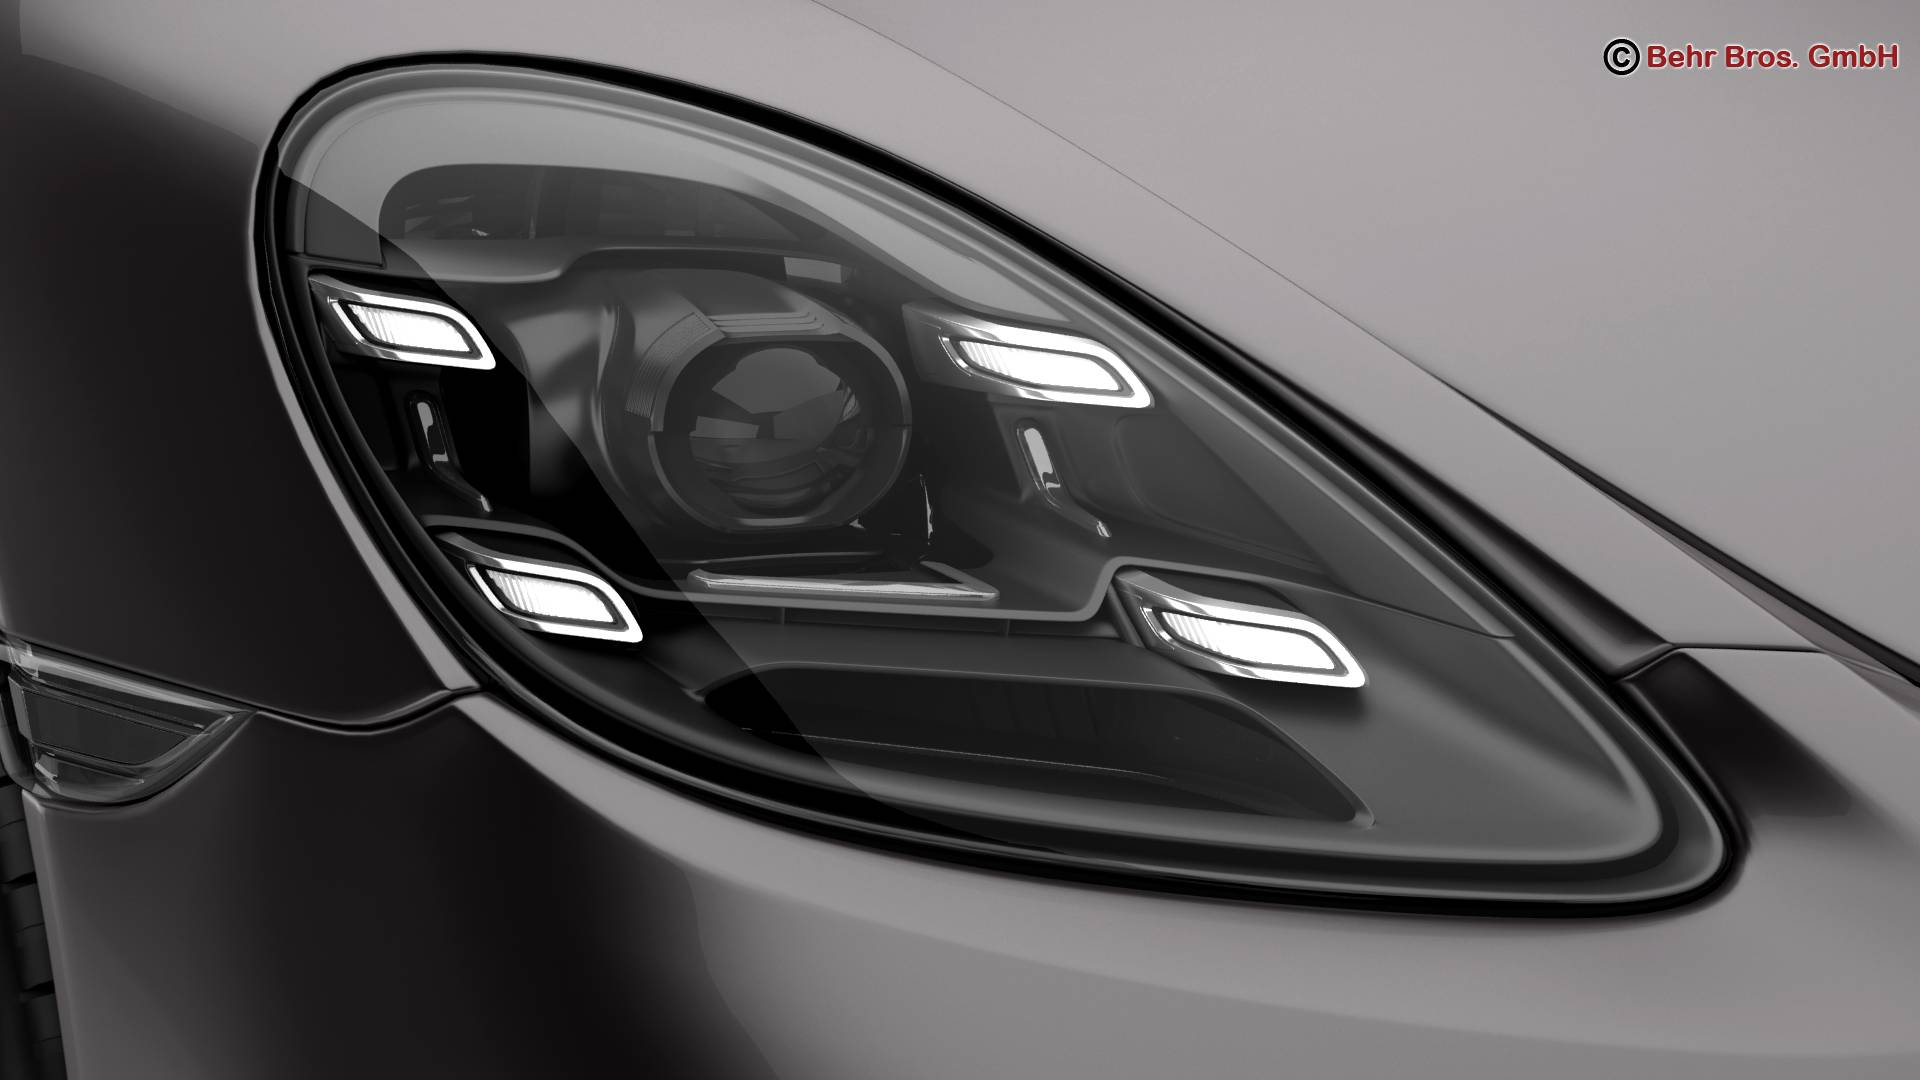 porsche 718 cayman 2017 3d model 3ds max fbx c4d lwo ma mb obj 220079